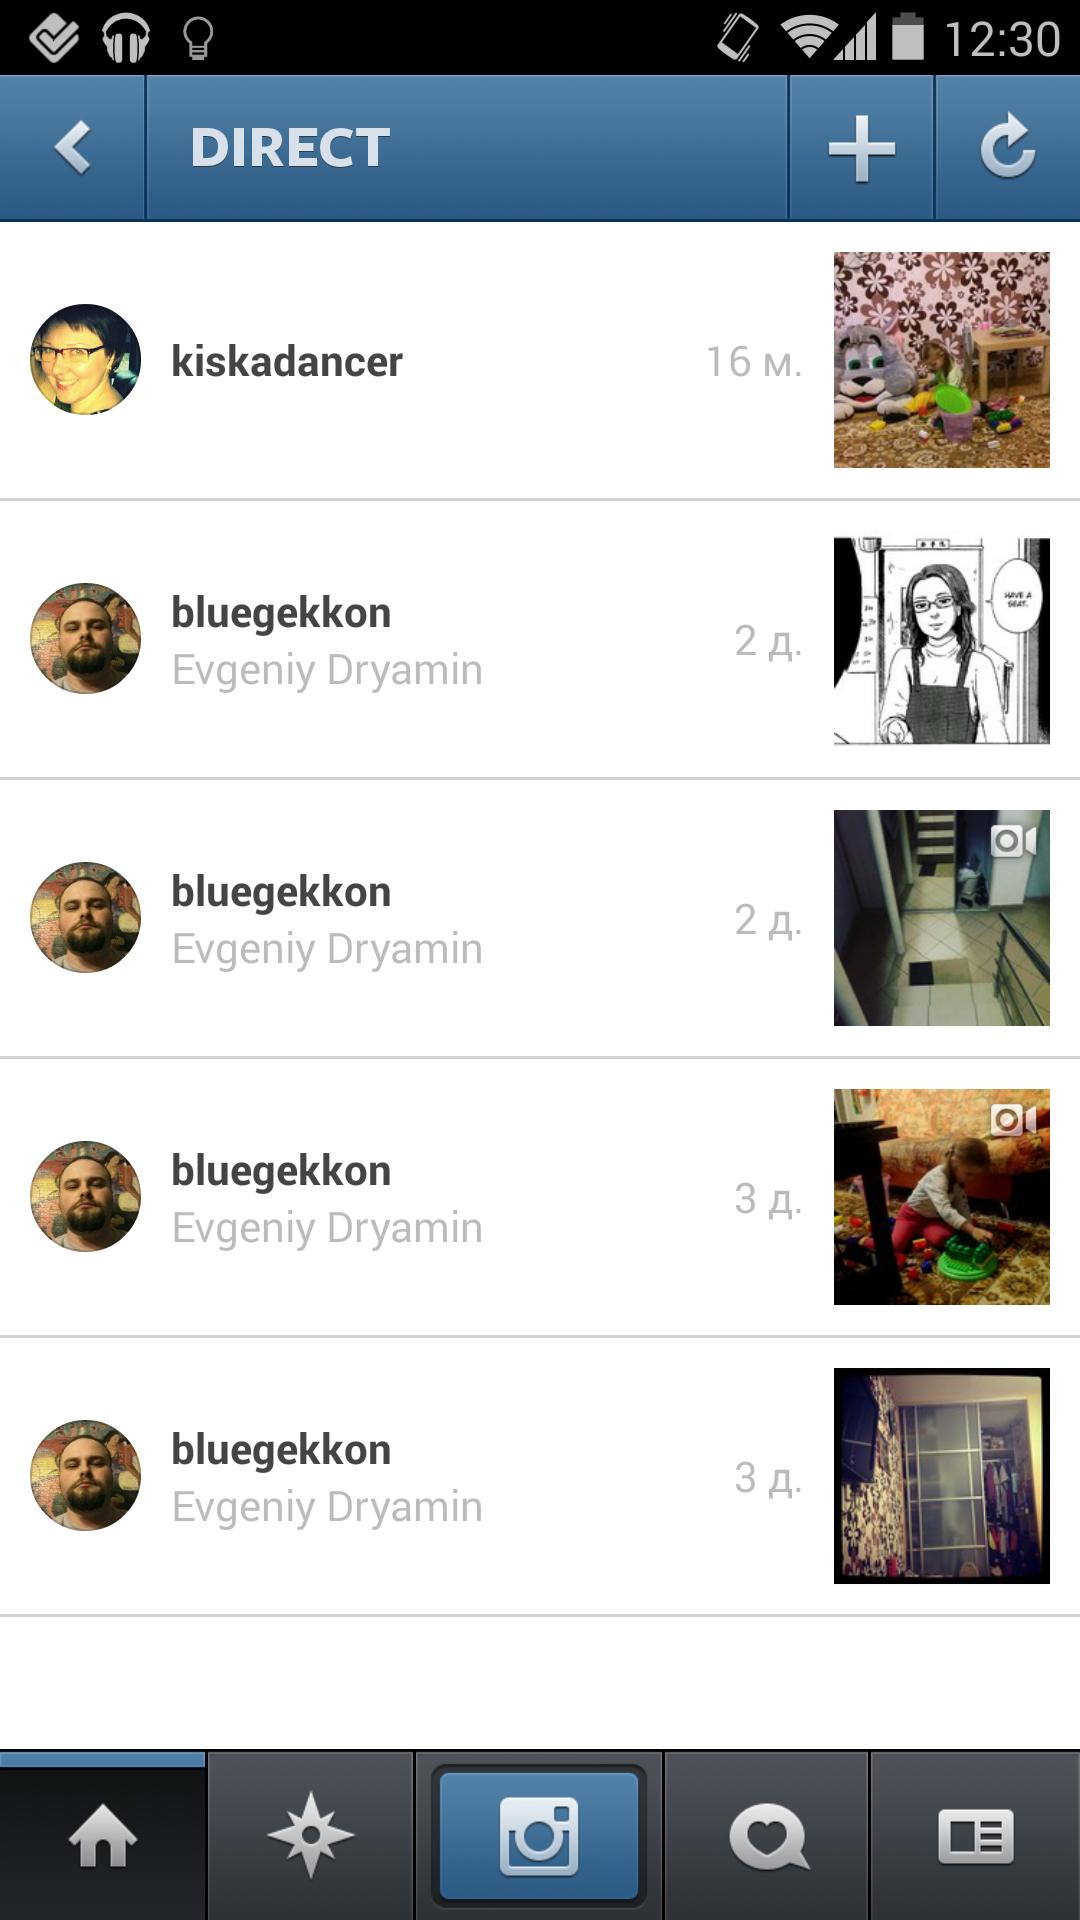 Директ в instagram на компьютере — 4 способа | remontka.pro